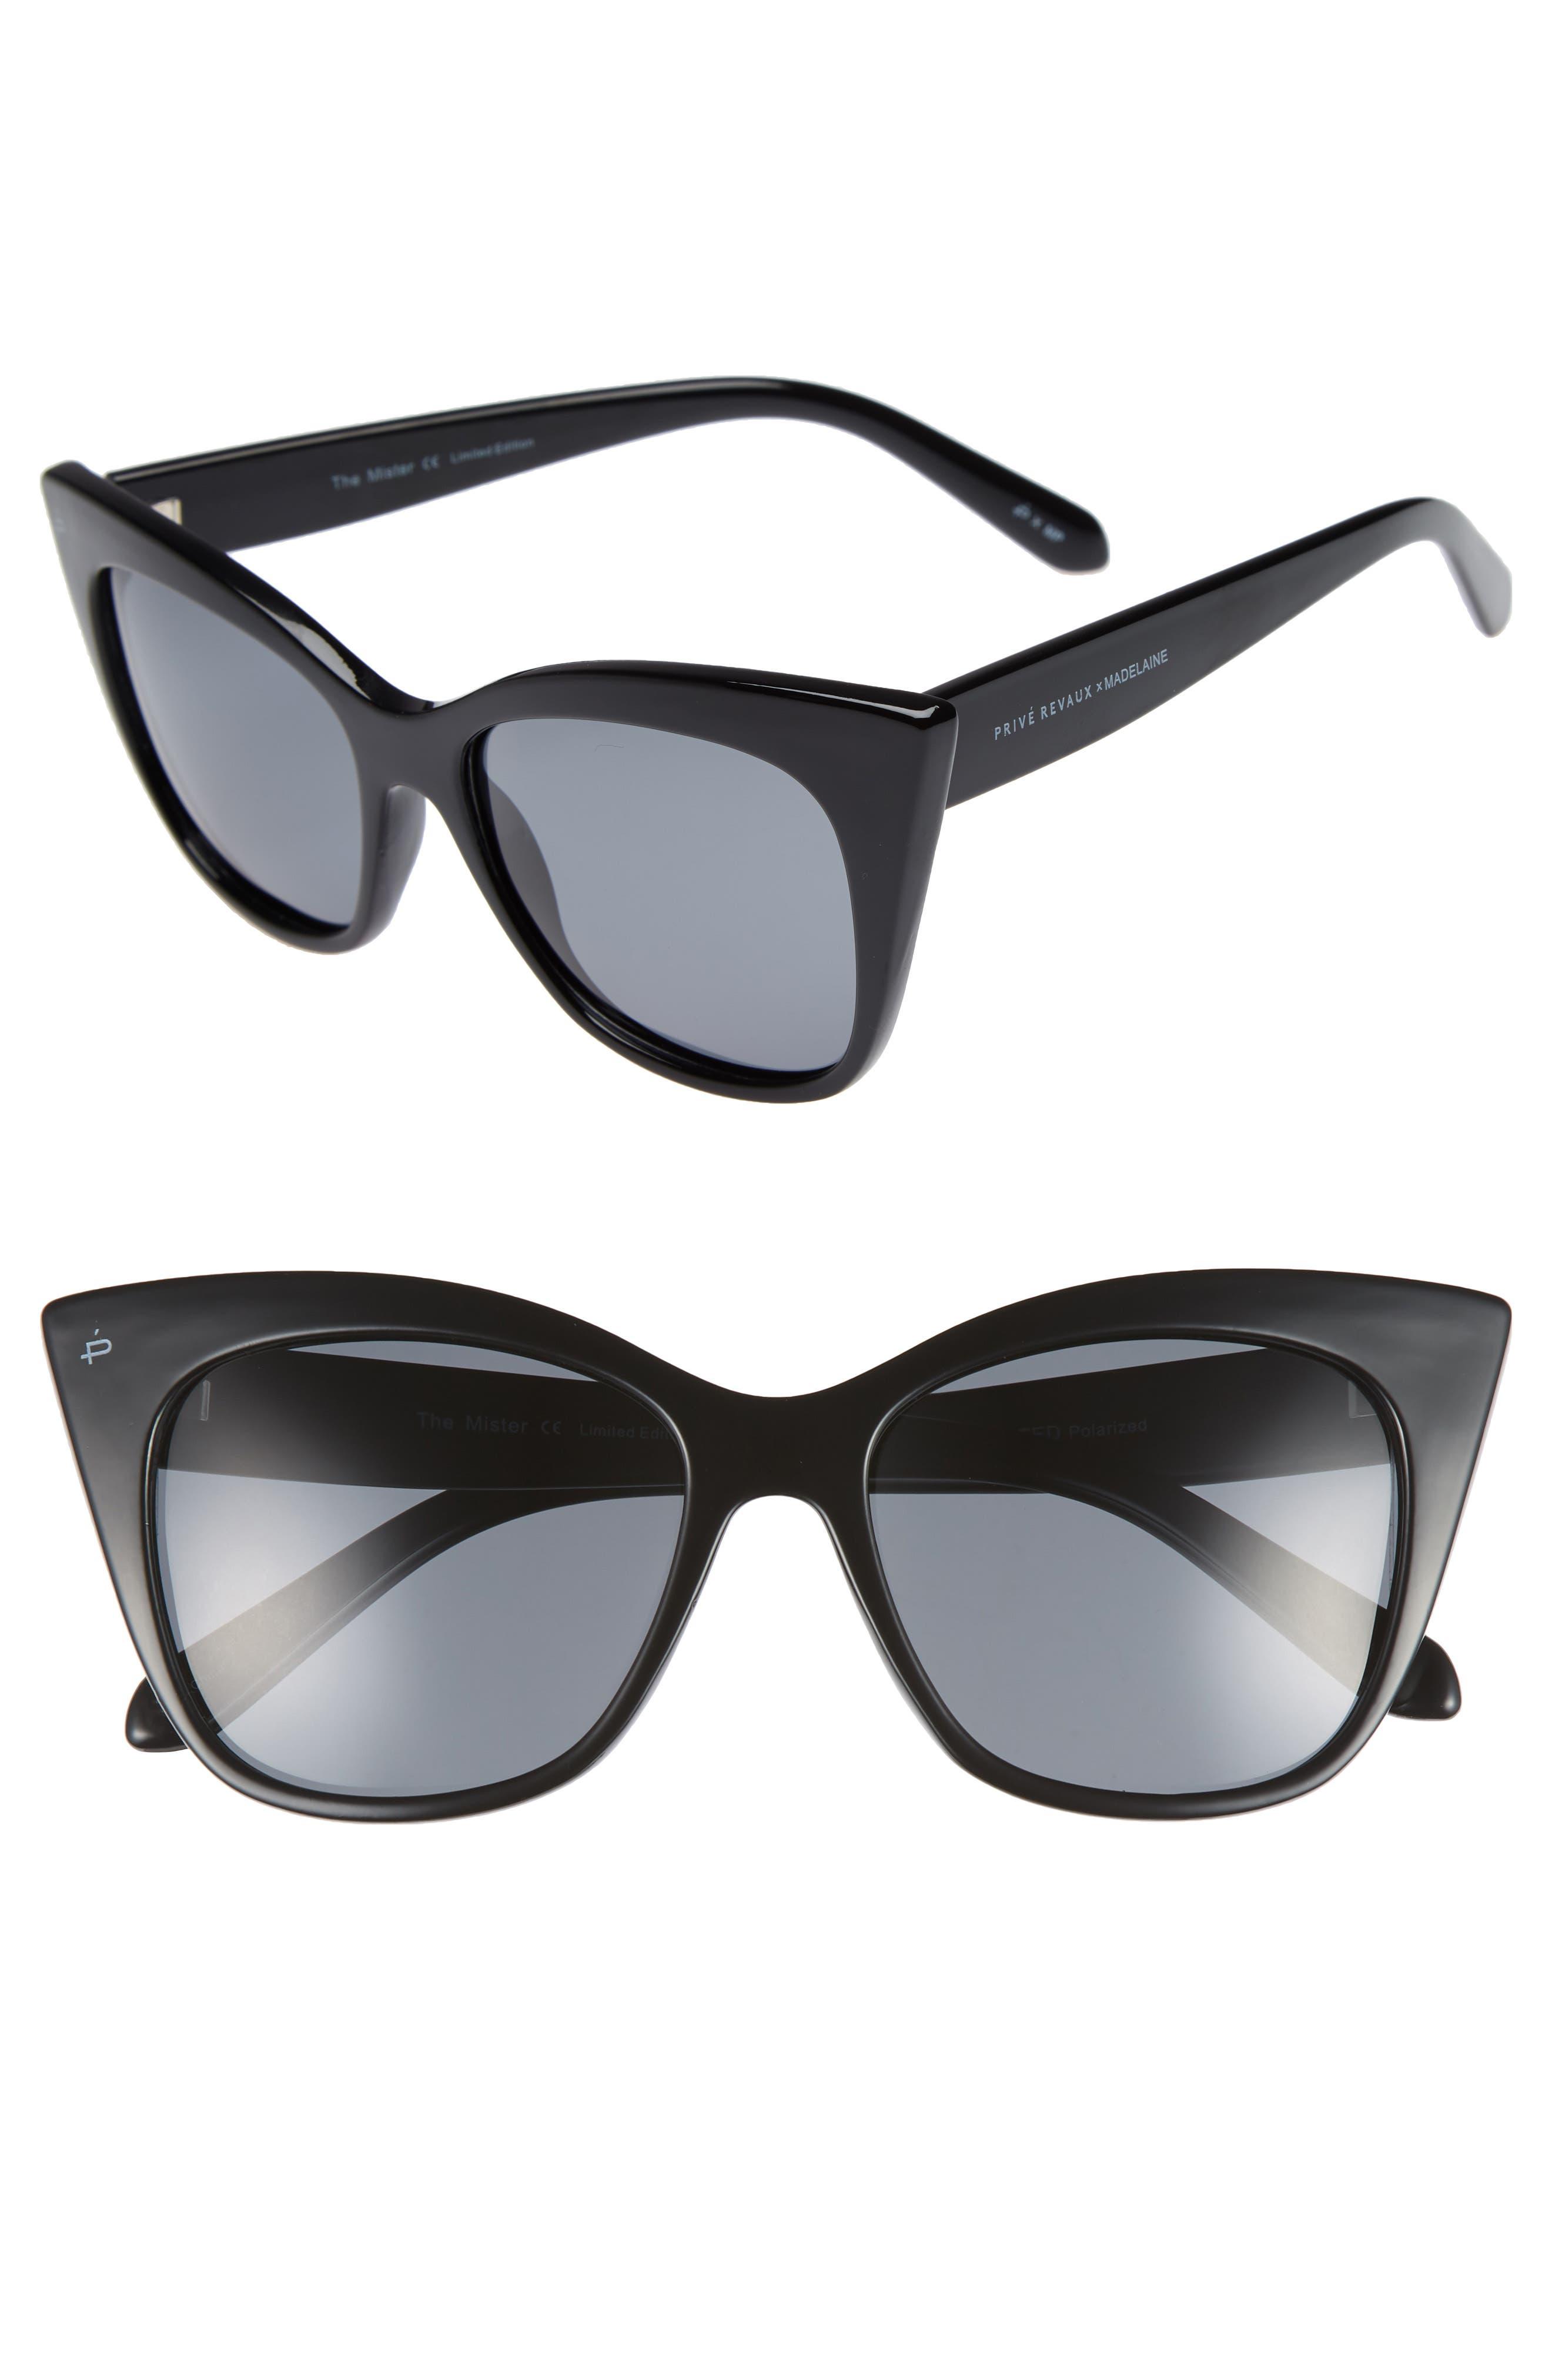 Privé Revaux x Madelaine Petsch The Mister 54mm Cat Eye Sunglasses,                         Main,                         color, BLACK/ BLACK